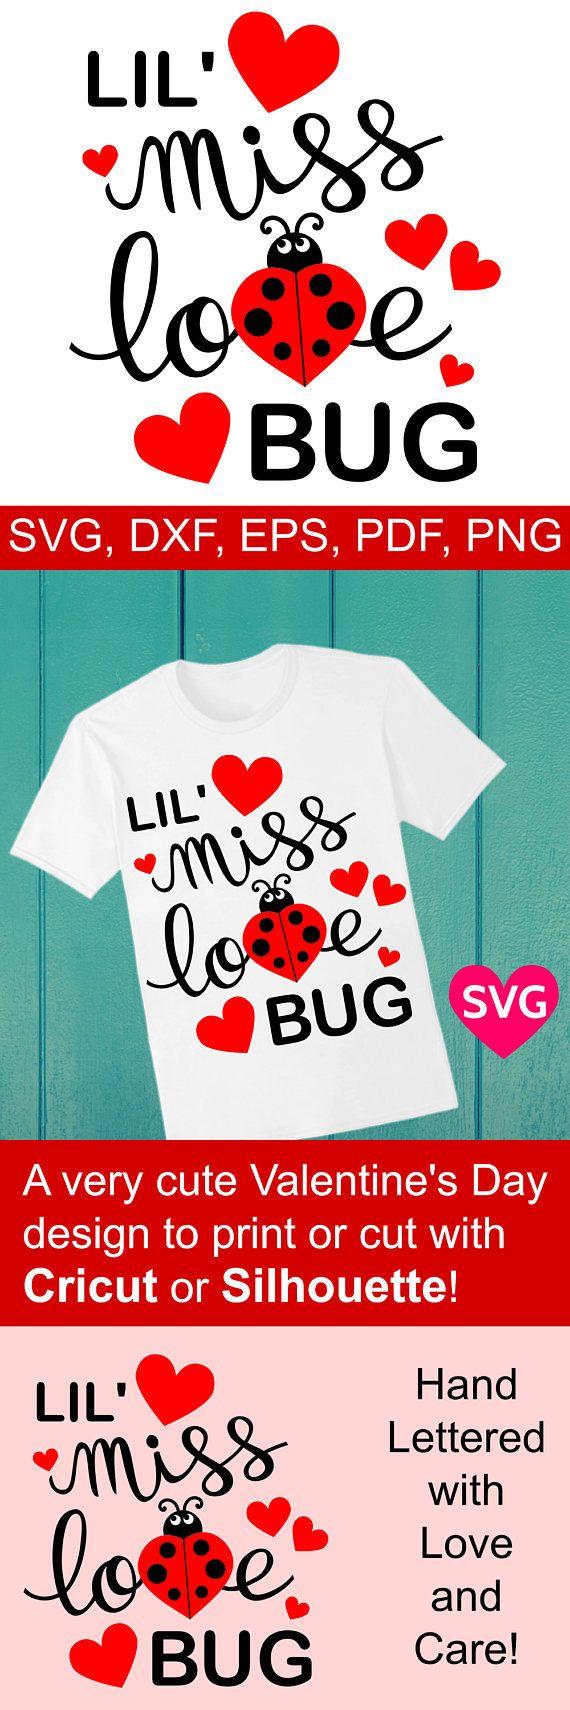 Adorable SVG file for Valentine's Day, Little Miss Love Bug